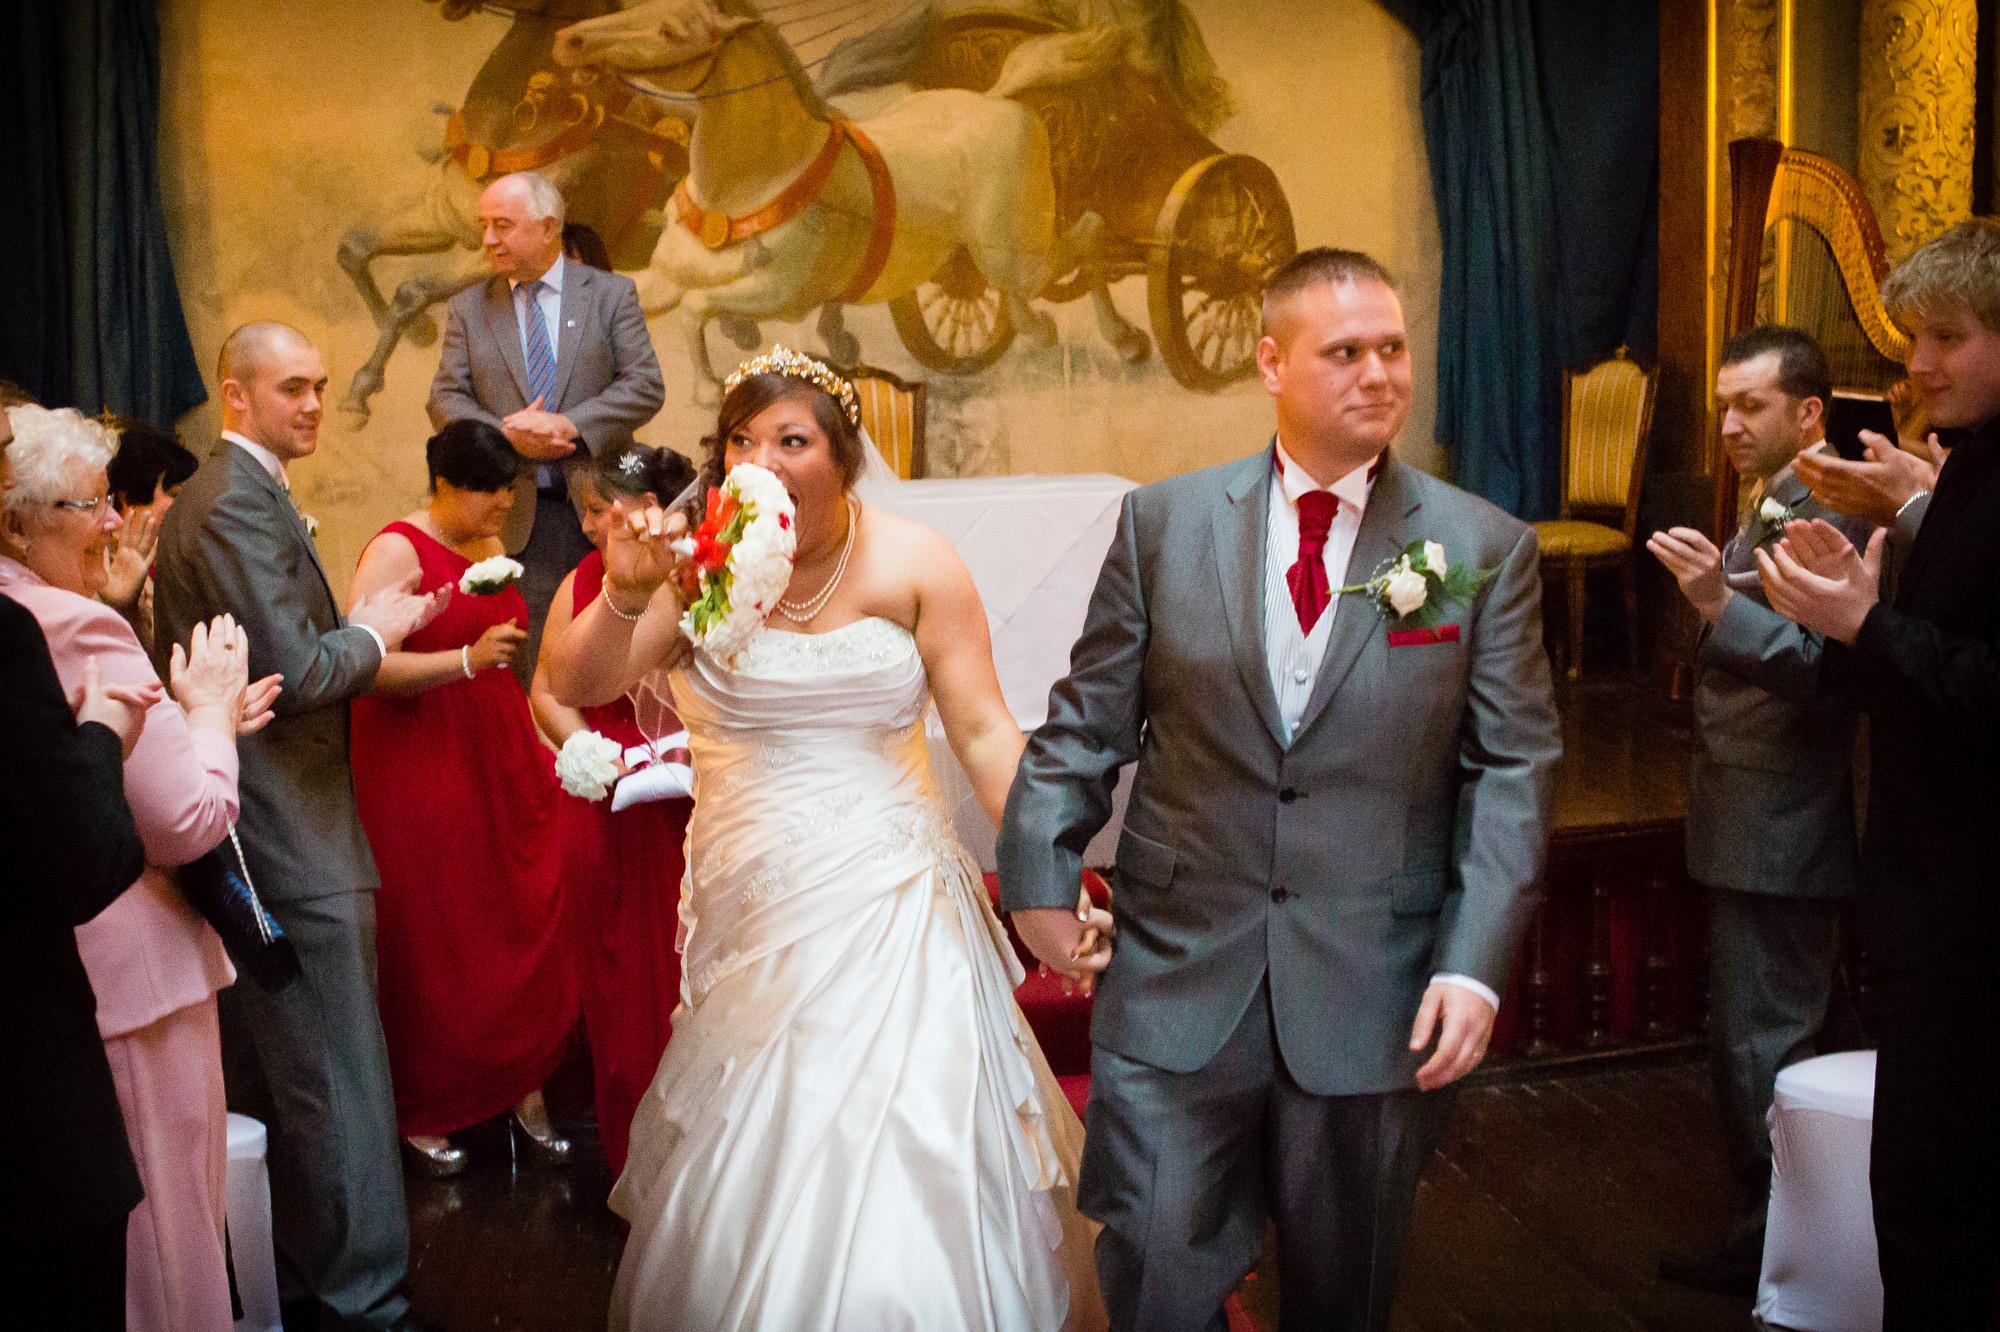 South Wales Wedding Photograher at Craig Y Nos Castle (17)